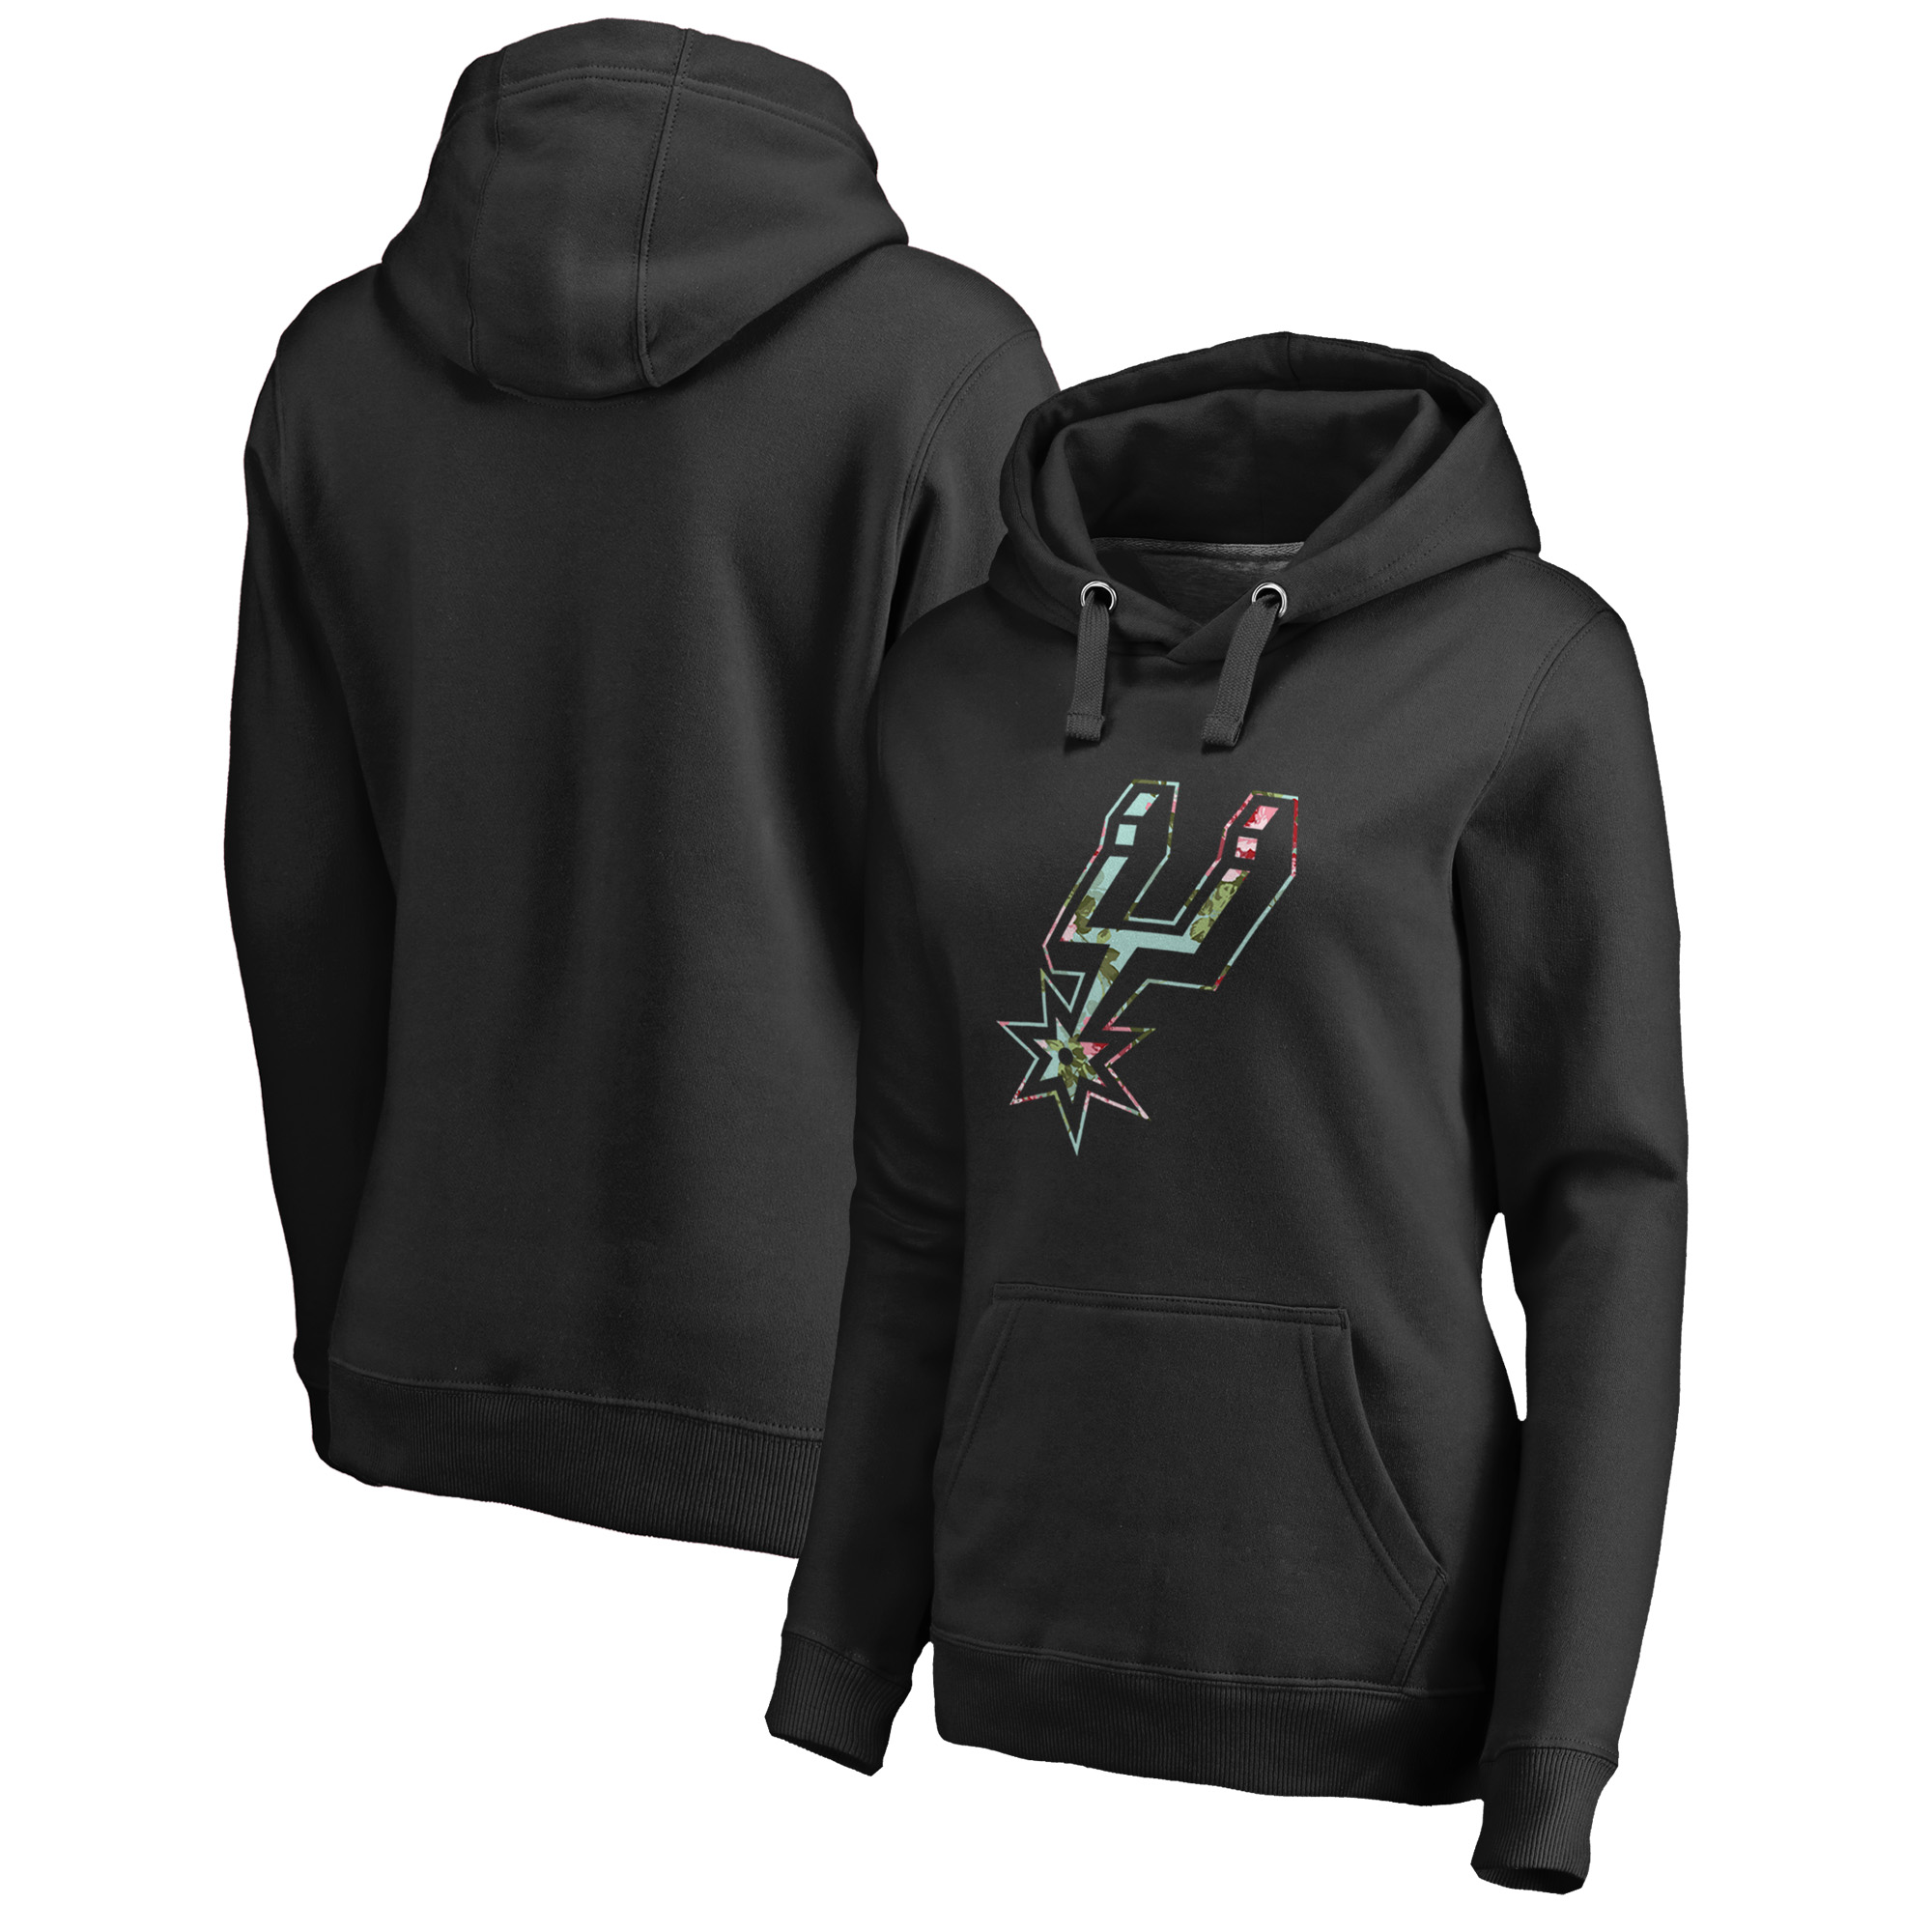 San Antonio Spurs Fanatics Branded Women's Lovely Pullover Hoodie - Black